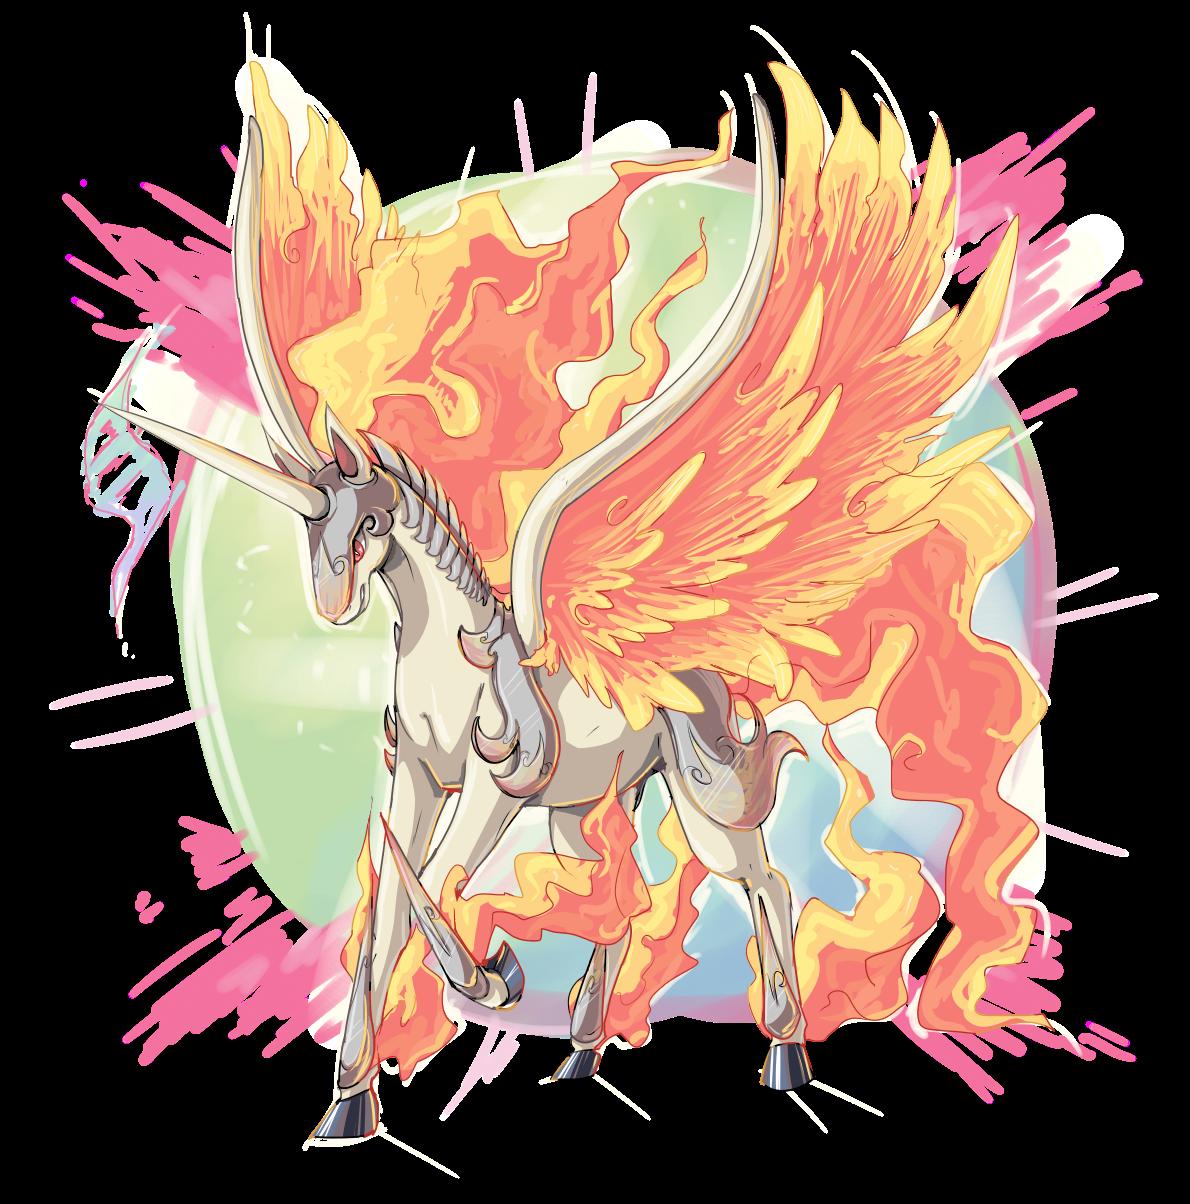 Pokémon by Review: #77 - #78: Ponyta & Rapidash